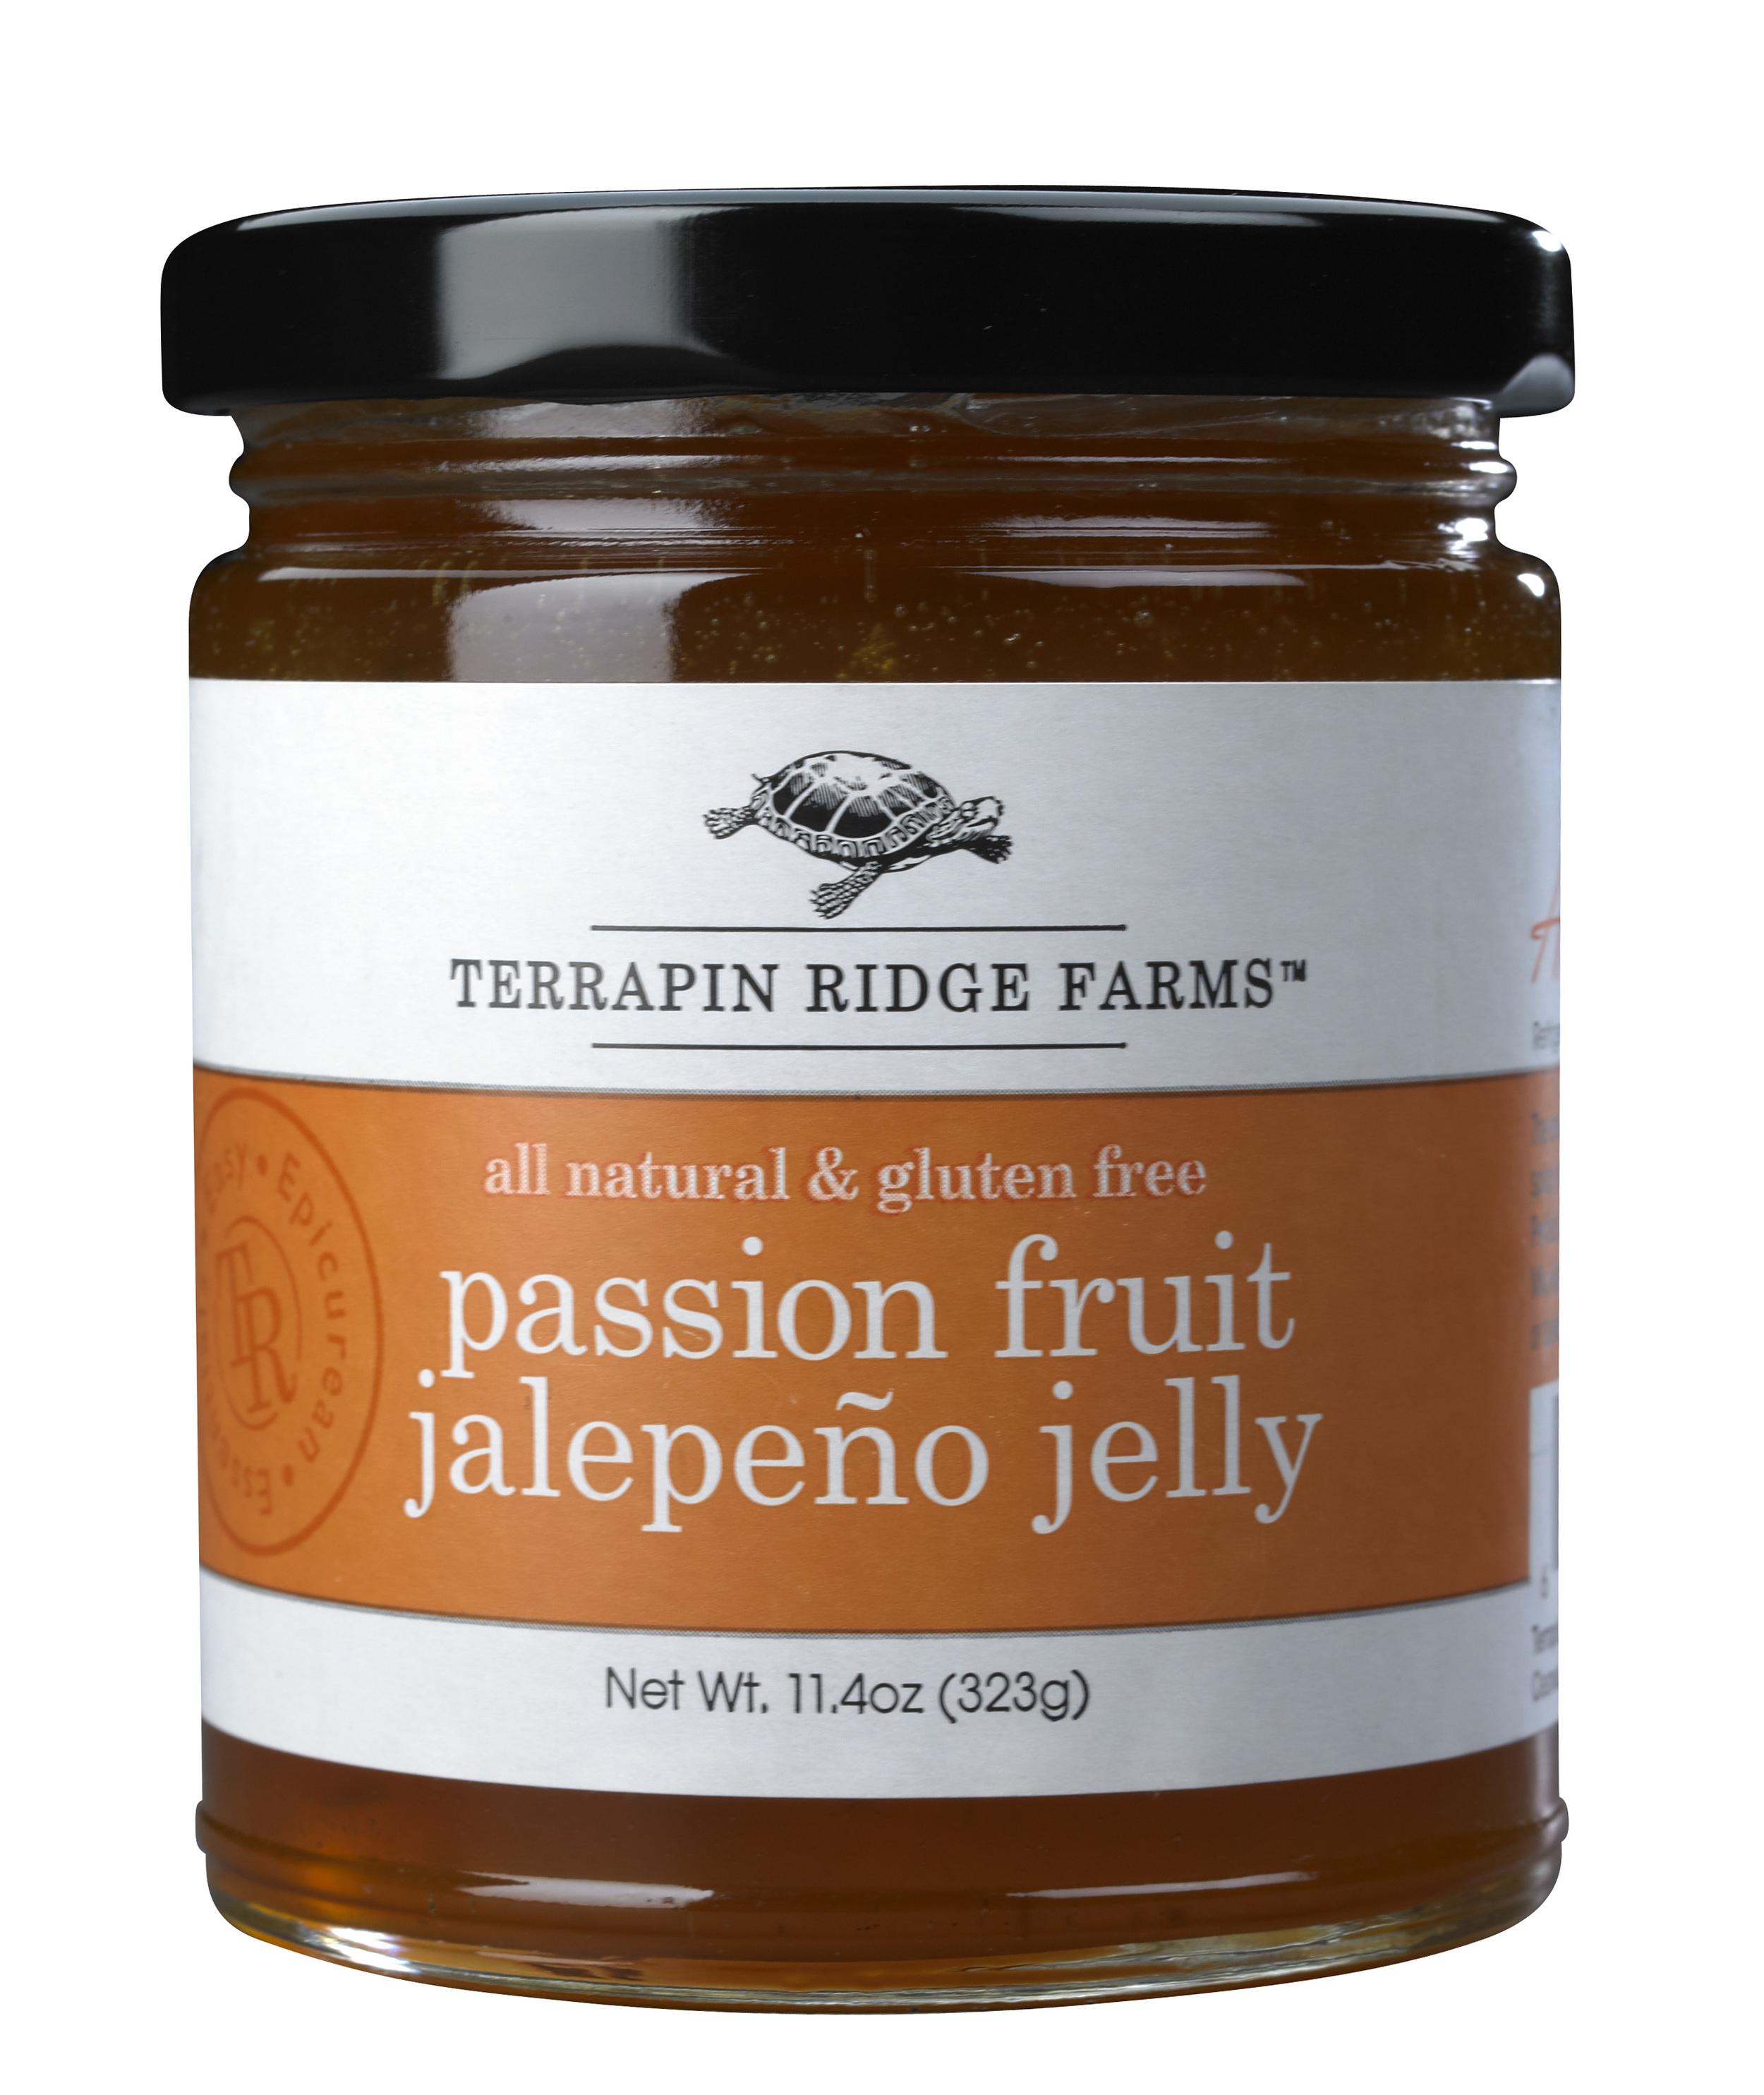 Terrapin Ridge Farms: Passion Fruit Jalapeno Gourmet Jelly